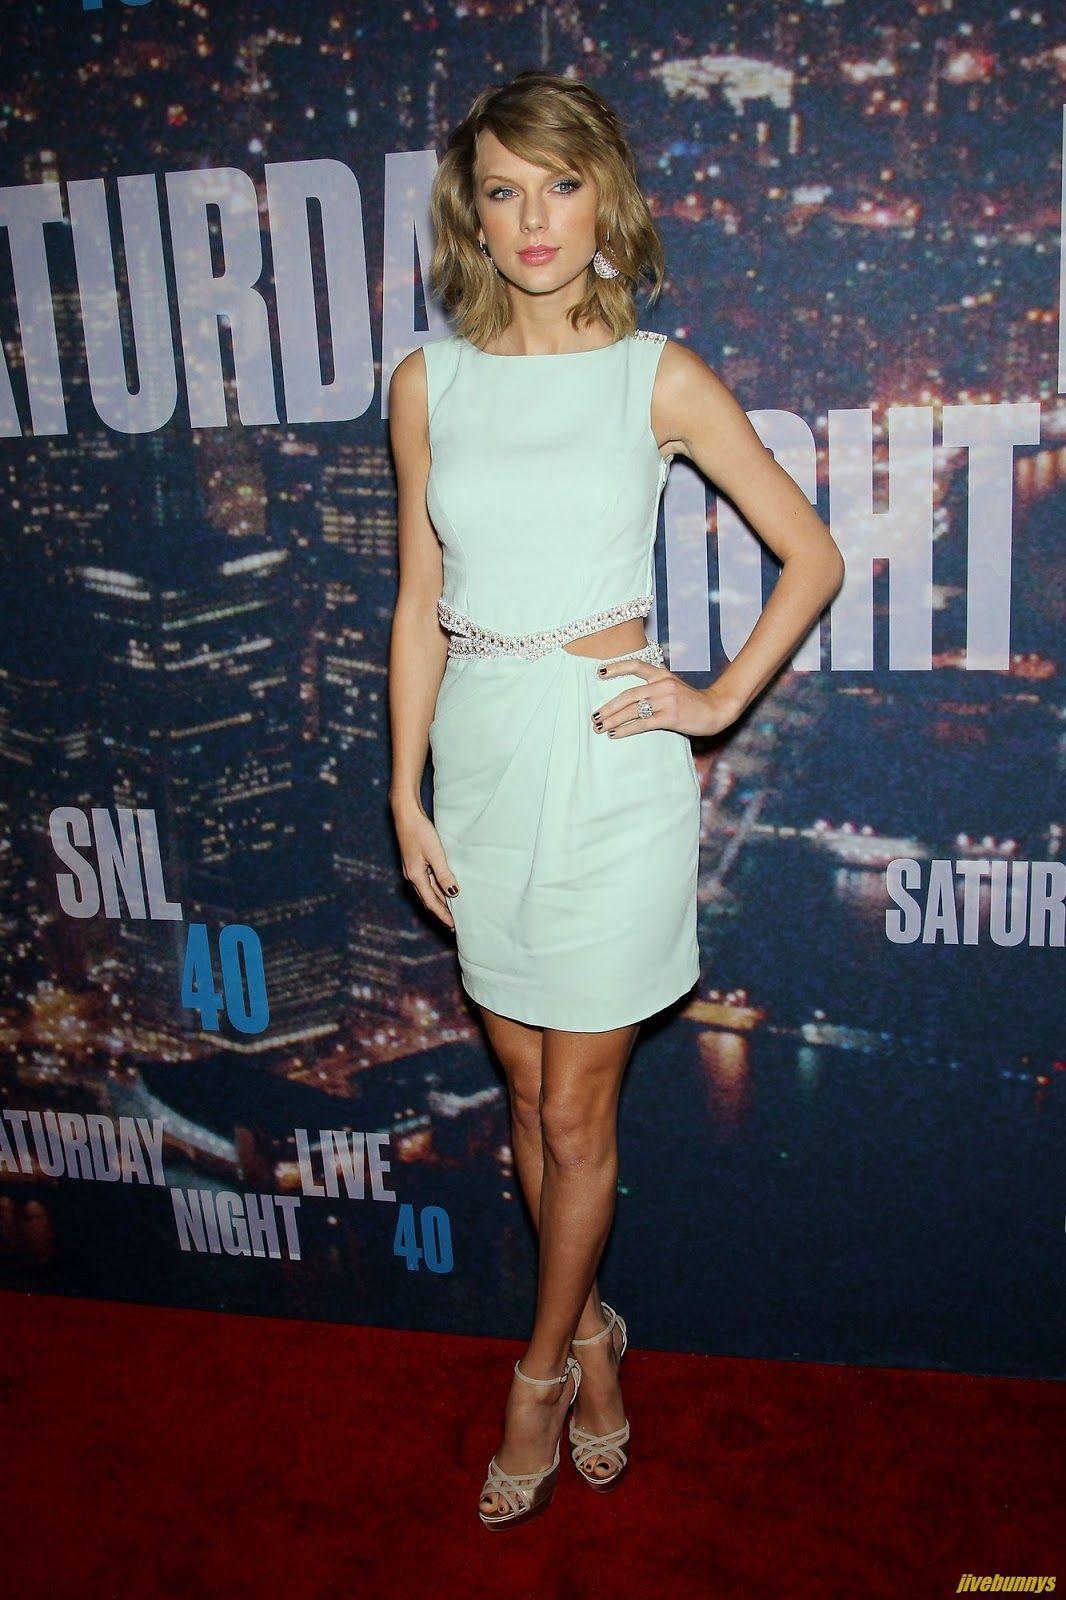 Taylor Swift Hot Celebrity Photo Gallery 12 Nice dresses